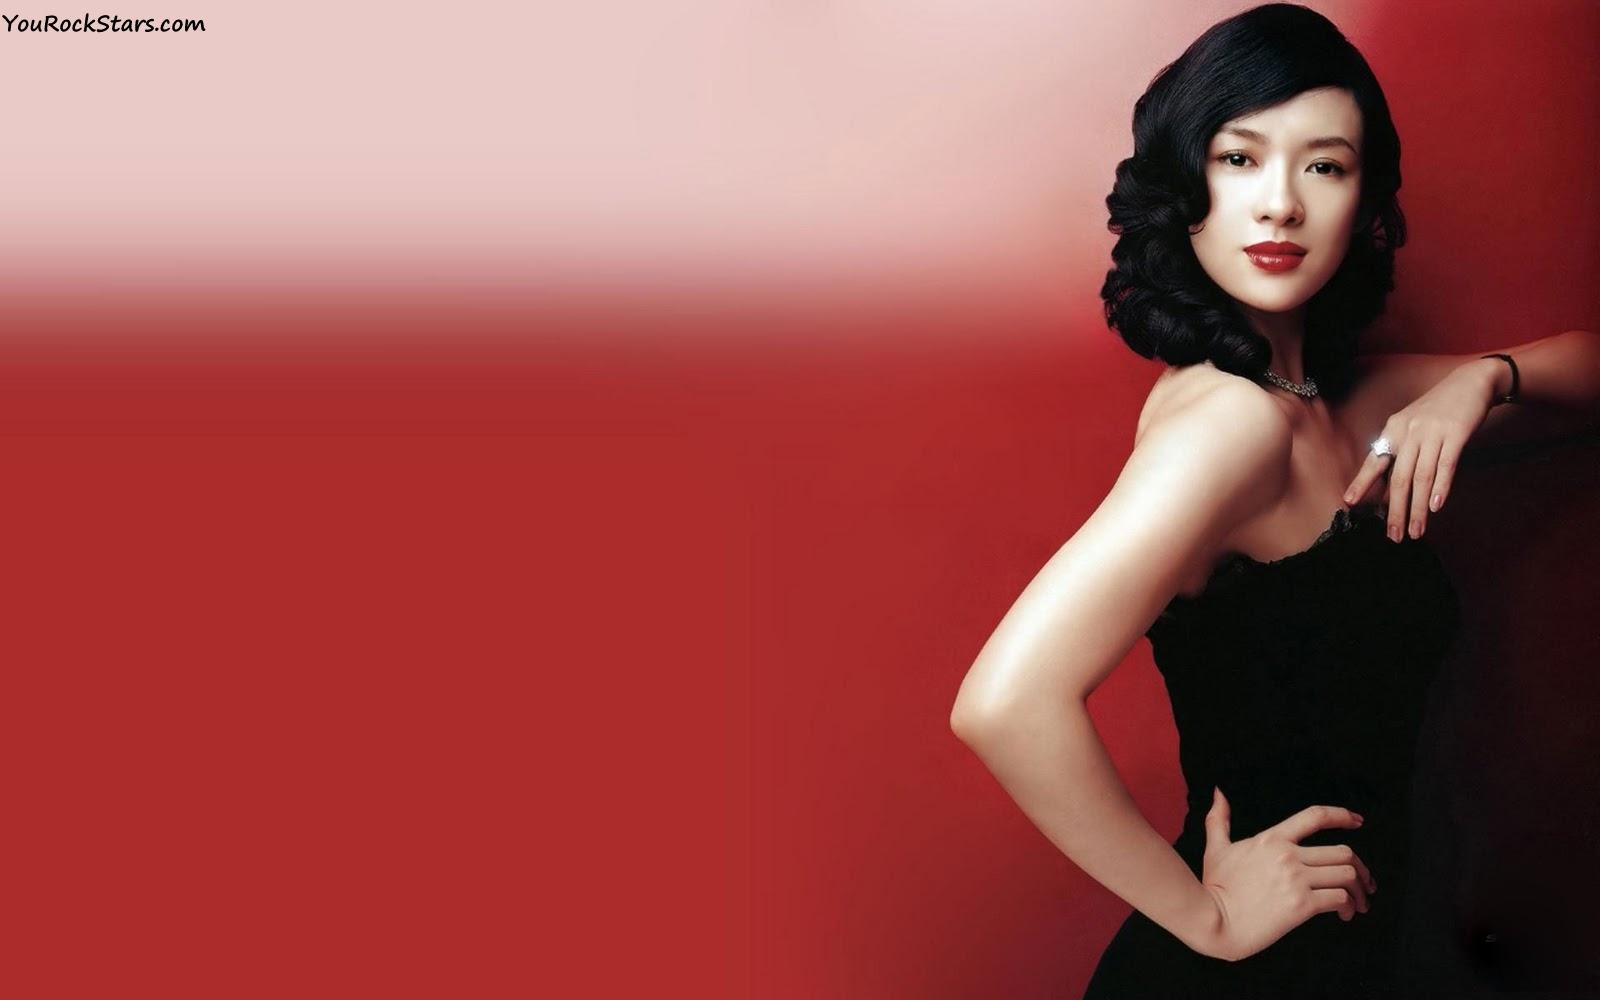 http://4.bp.blogspot.com/-38XNLhuZdjY/UBmXz38QODI/AAAAAAAAgjI/5oKaH1kxgkM/s1600/Zhang_Ziyi_LoveForLife_CelebUtopia_Sexy-HD_Wallpaper,Hot,Bikini,Naked,Without+clothes,Cute_Actress,fuck,High,+resolution,+geisha,vivi,beach,+(28).jpg